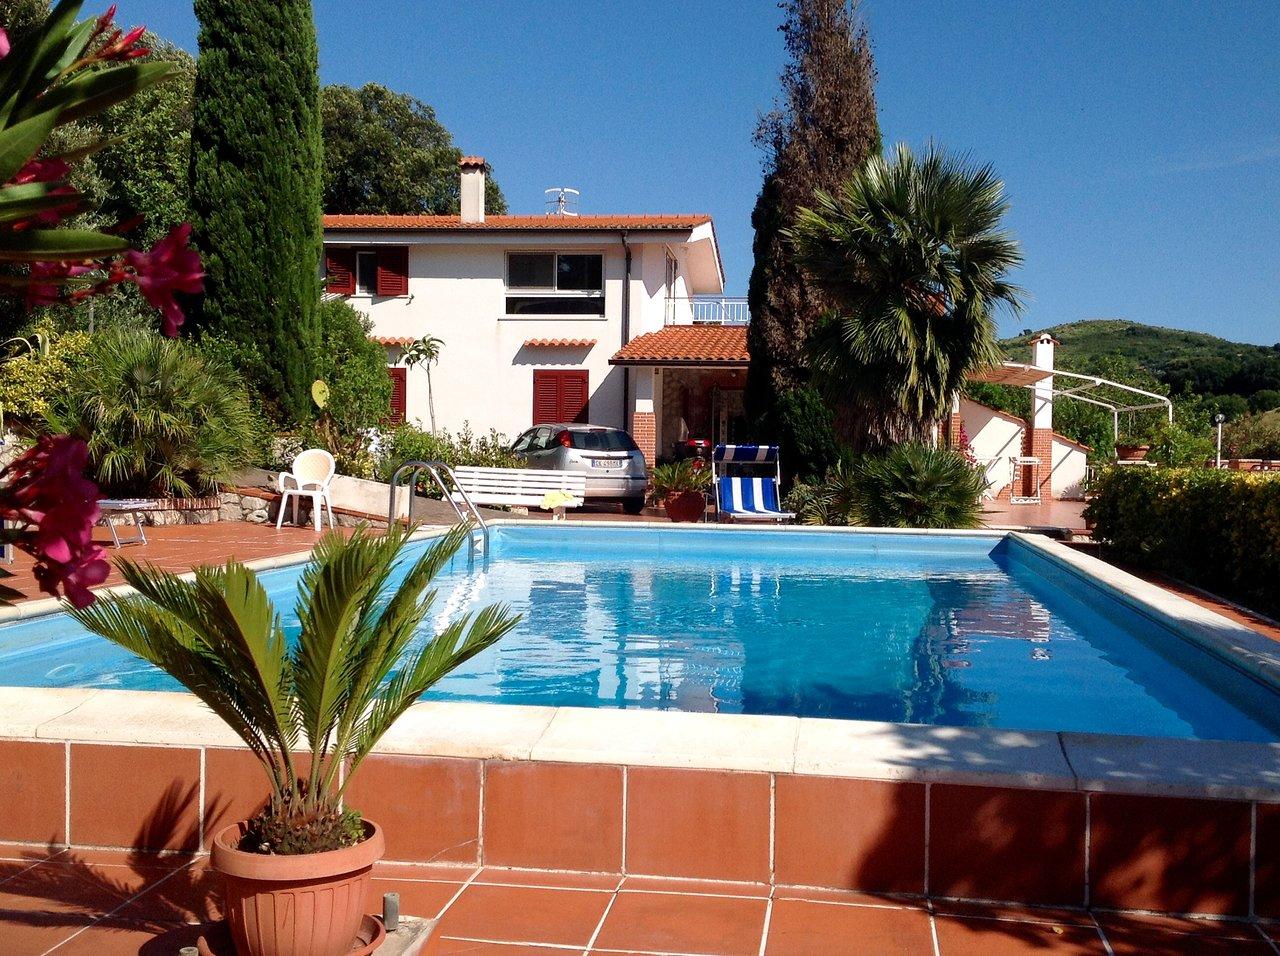 Antica Villa Gaeta amarillo casa vacanze b&b - prices & hotel reviews (gaeta